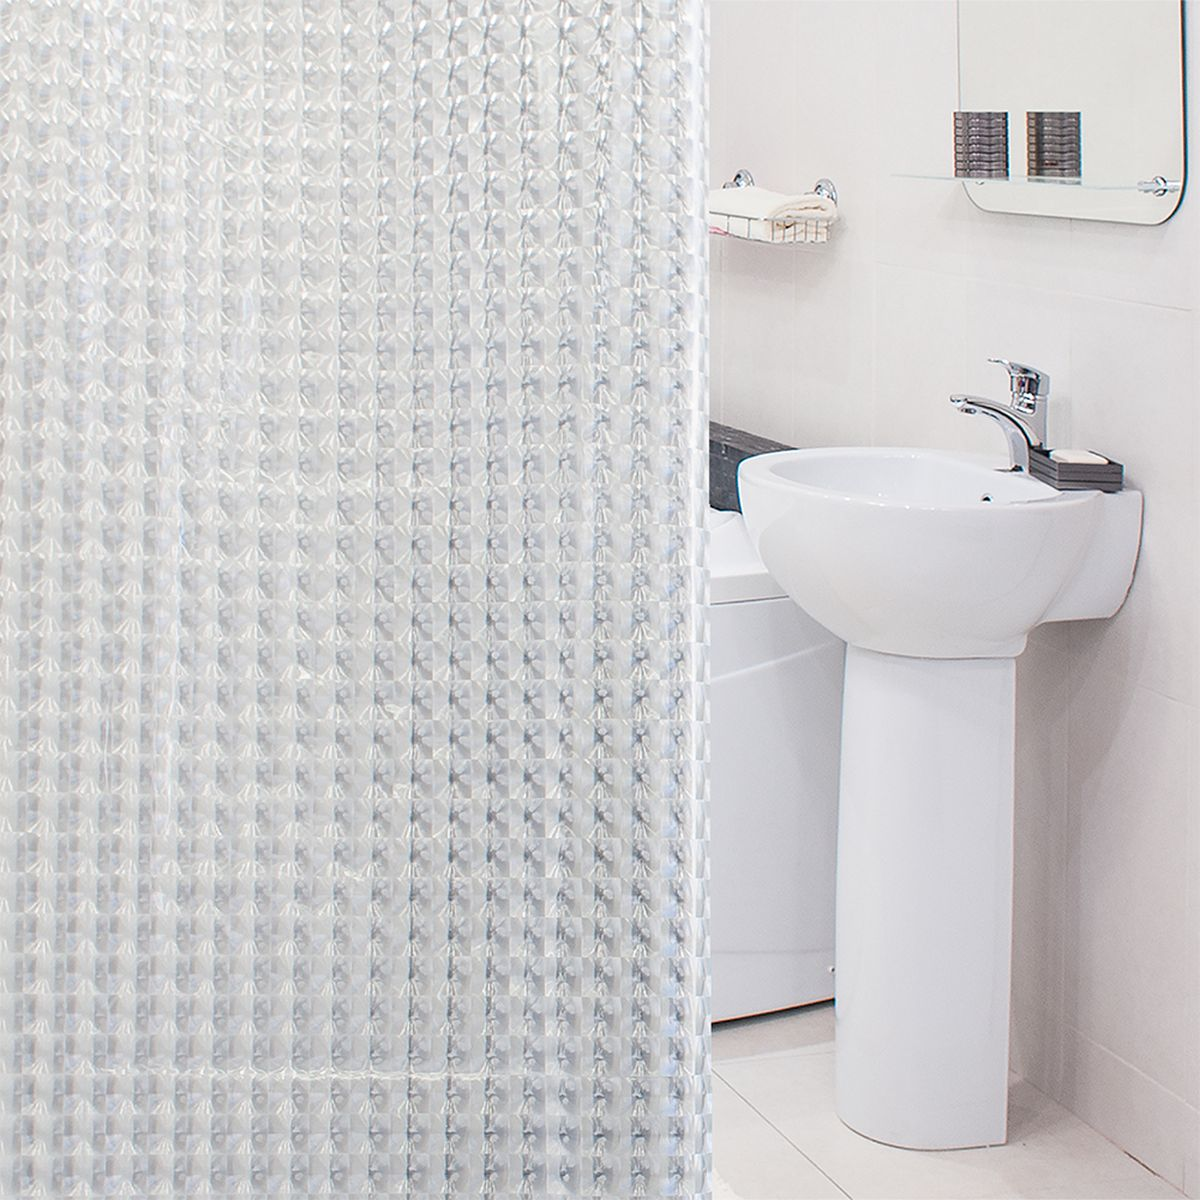 Штора для ванной комнаты 3D Tatkraft Crystal, с кольцами, 180 х 180 см tatkraft mega lock